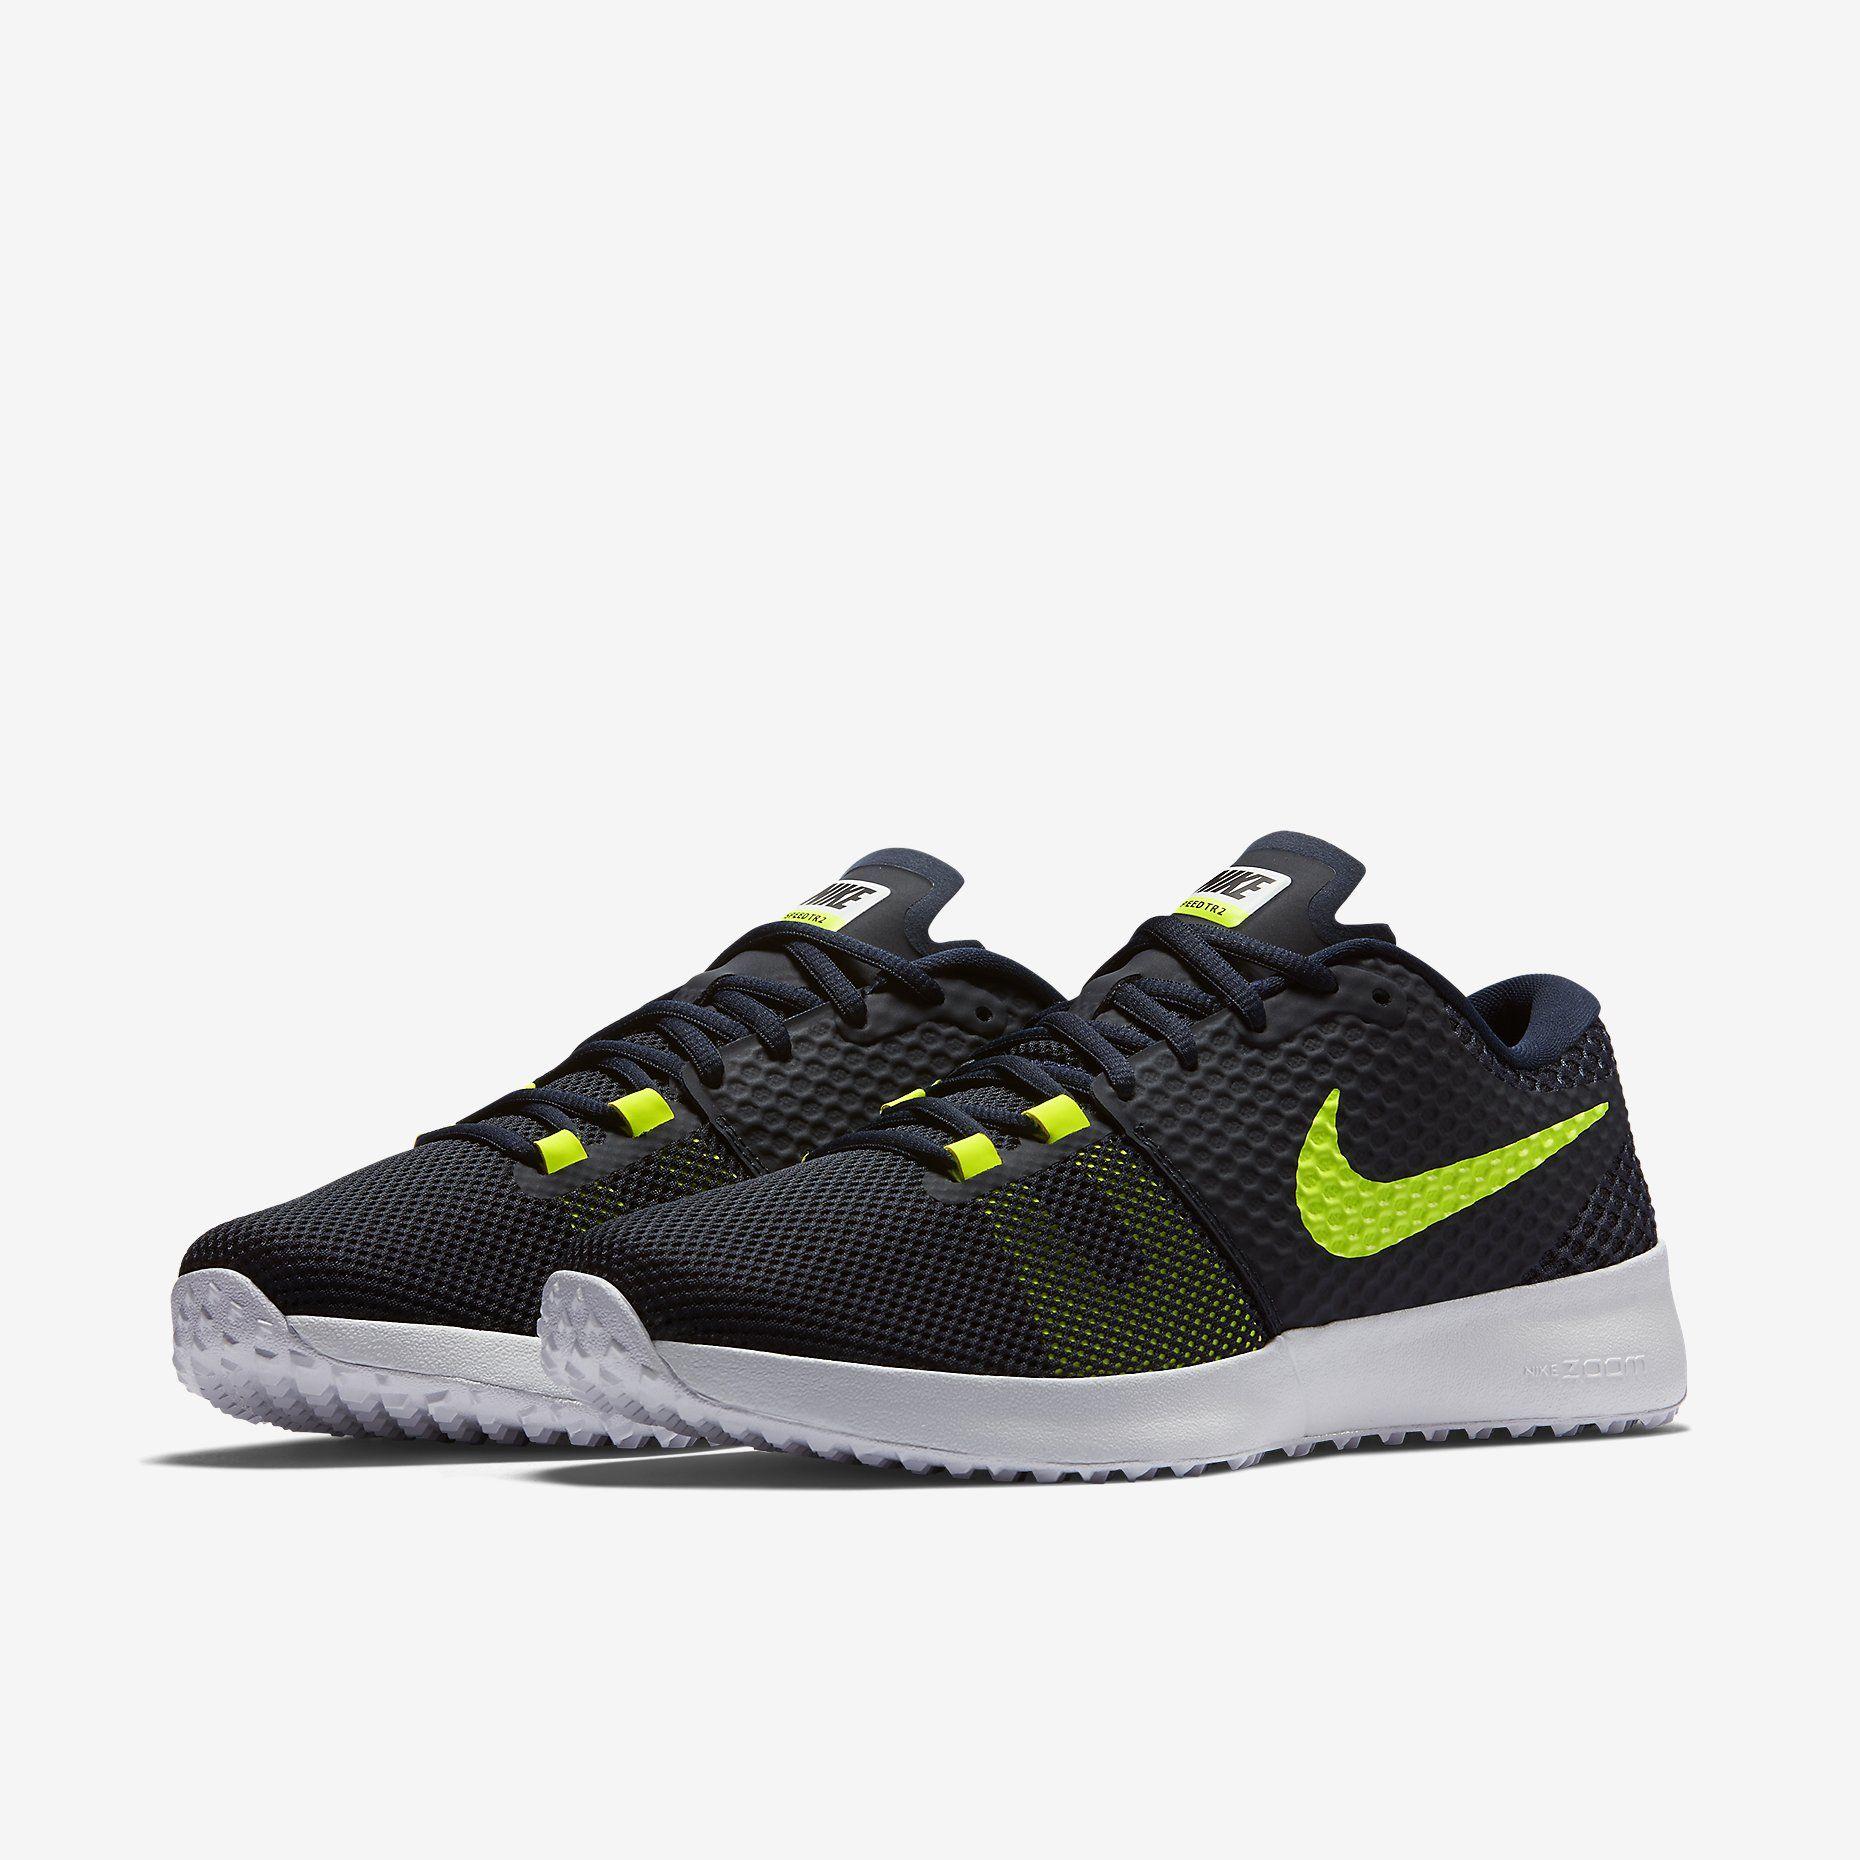 new style 11e10 d4b90 ... black ecc4f 479b2  inexpensive nike zoom speed trainer 2 mens training  shoe. nike store 30feb 747c8